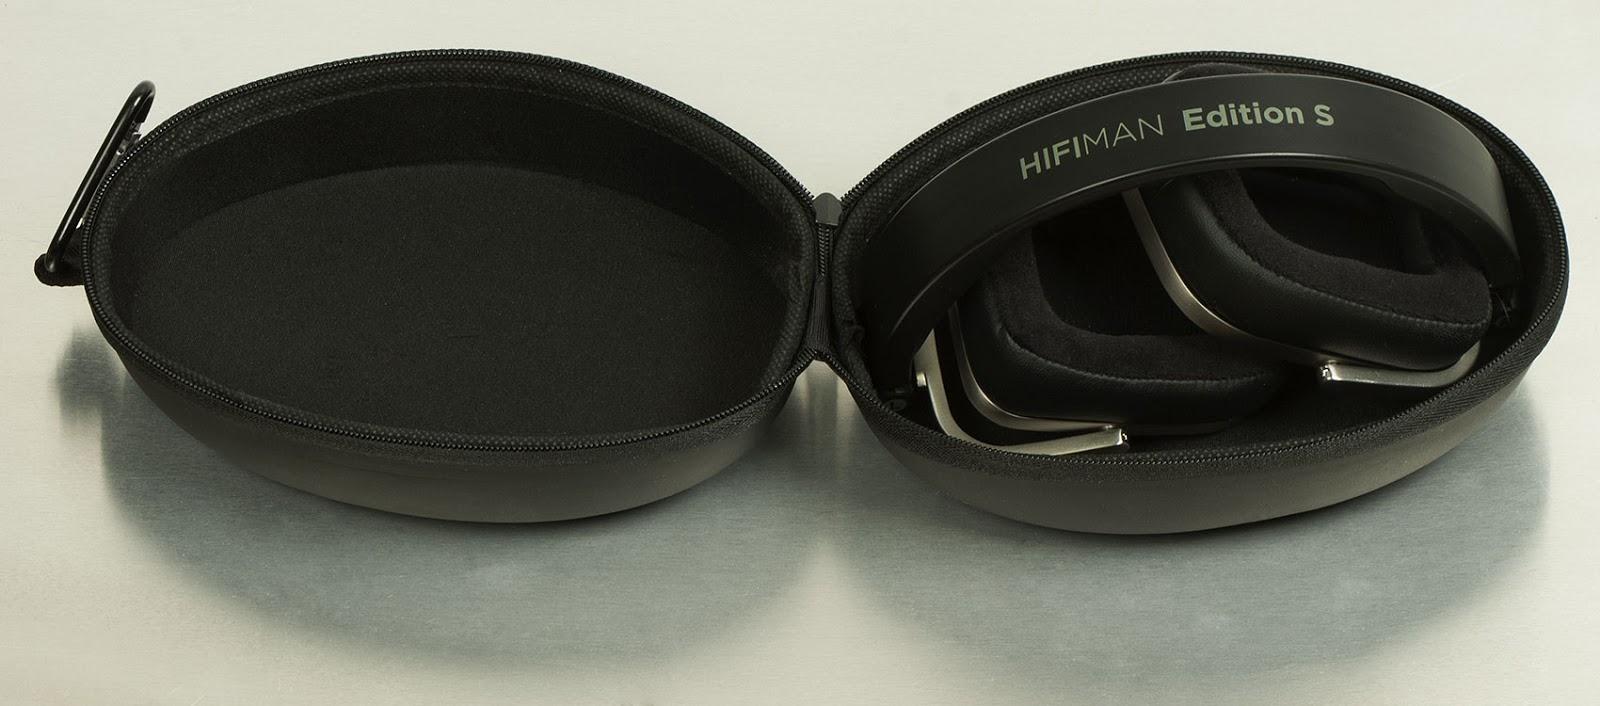 Пара новинок от HiFiMAN: Edition S и Edition X - 5